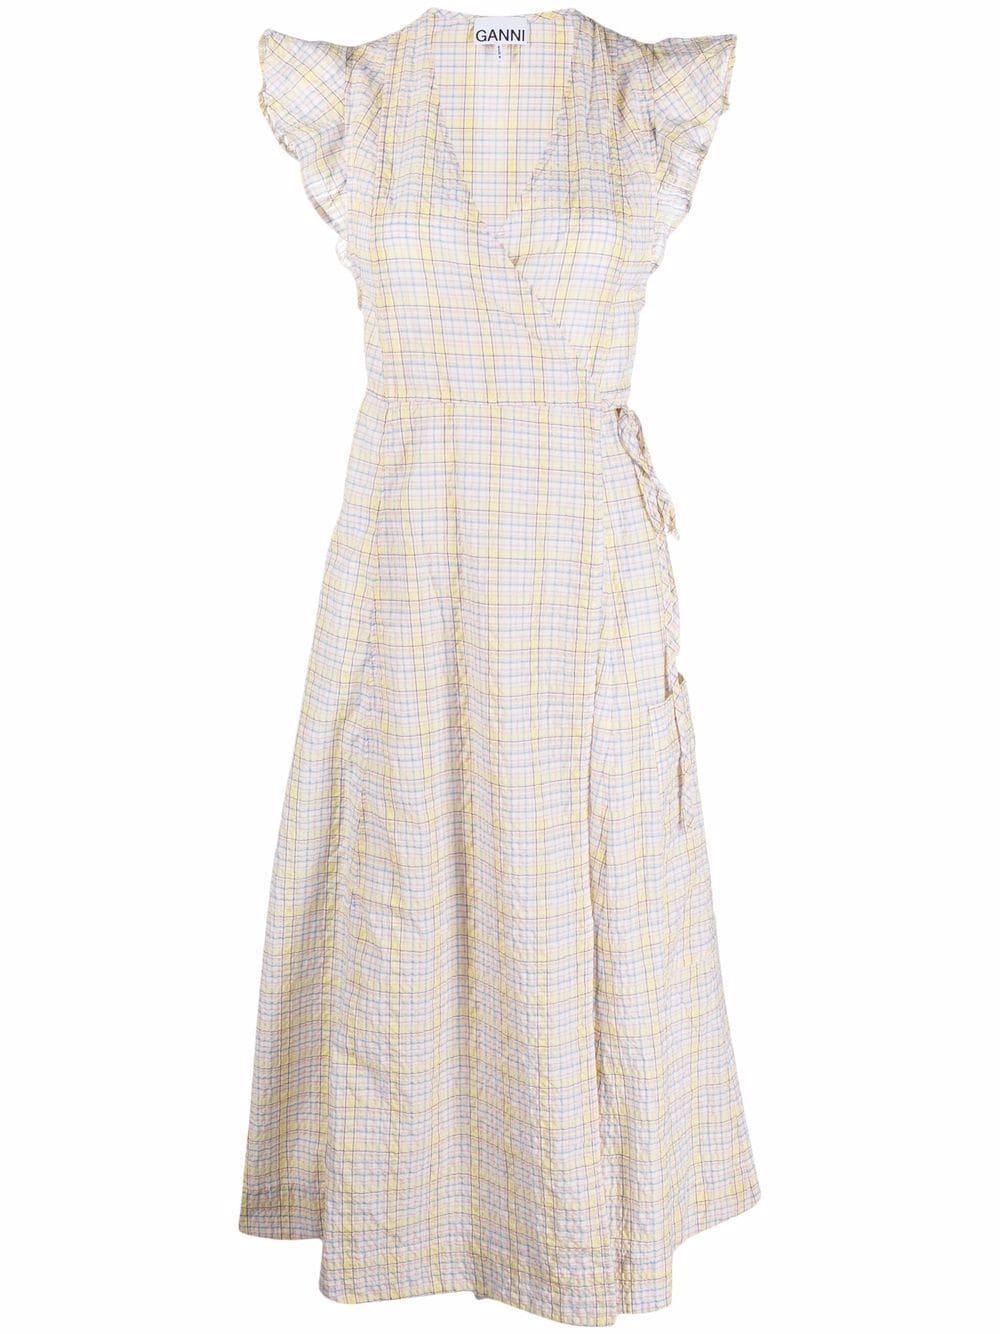 Seersucker Check Wrap Dress Item # F6067